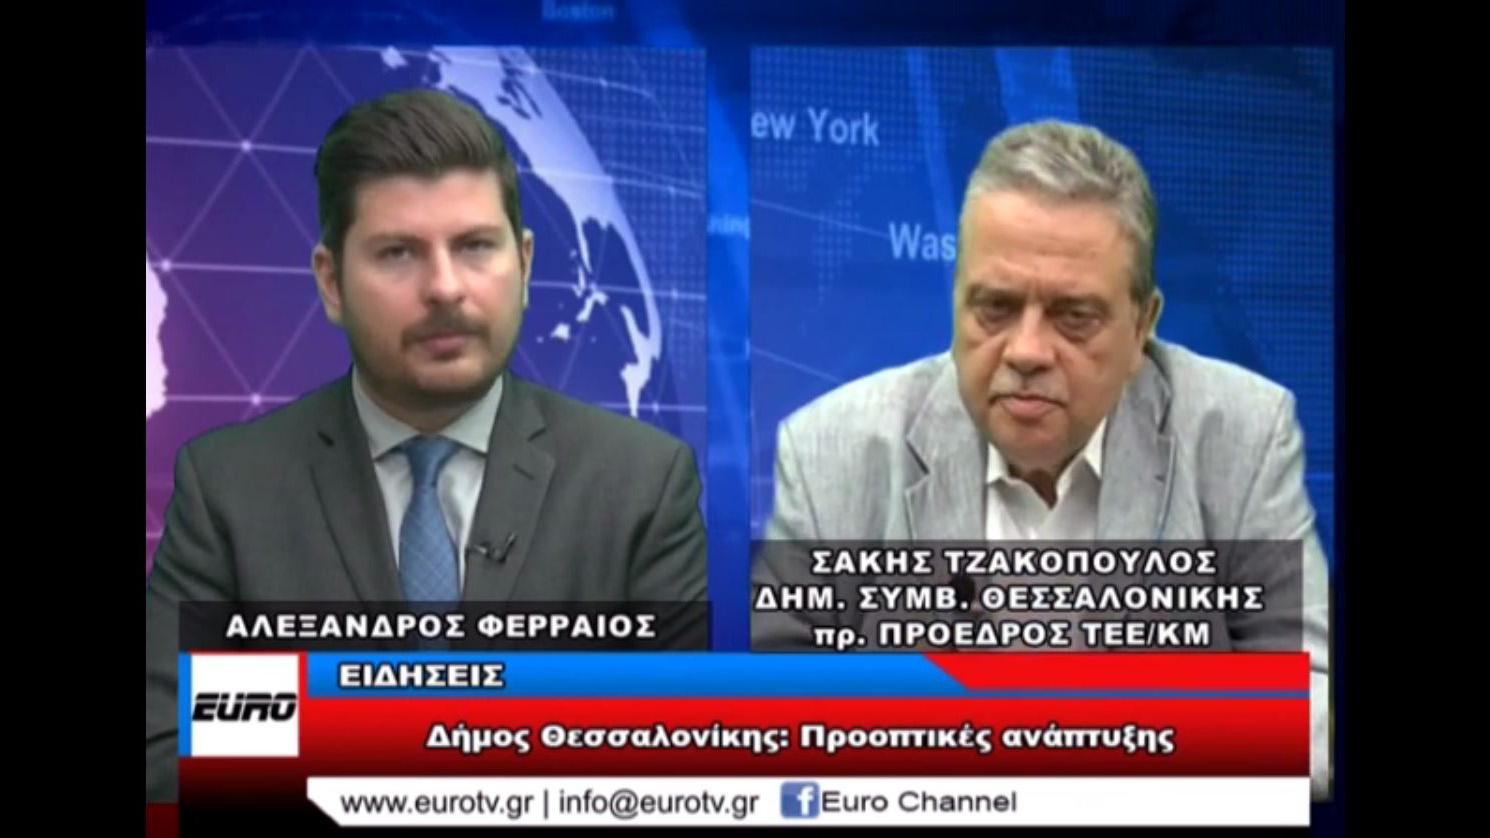 26-09-2019 | Euro Channel | Δελτίο Ειδήσεων με τον Αλέξανδρο Φερραίο